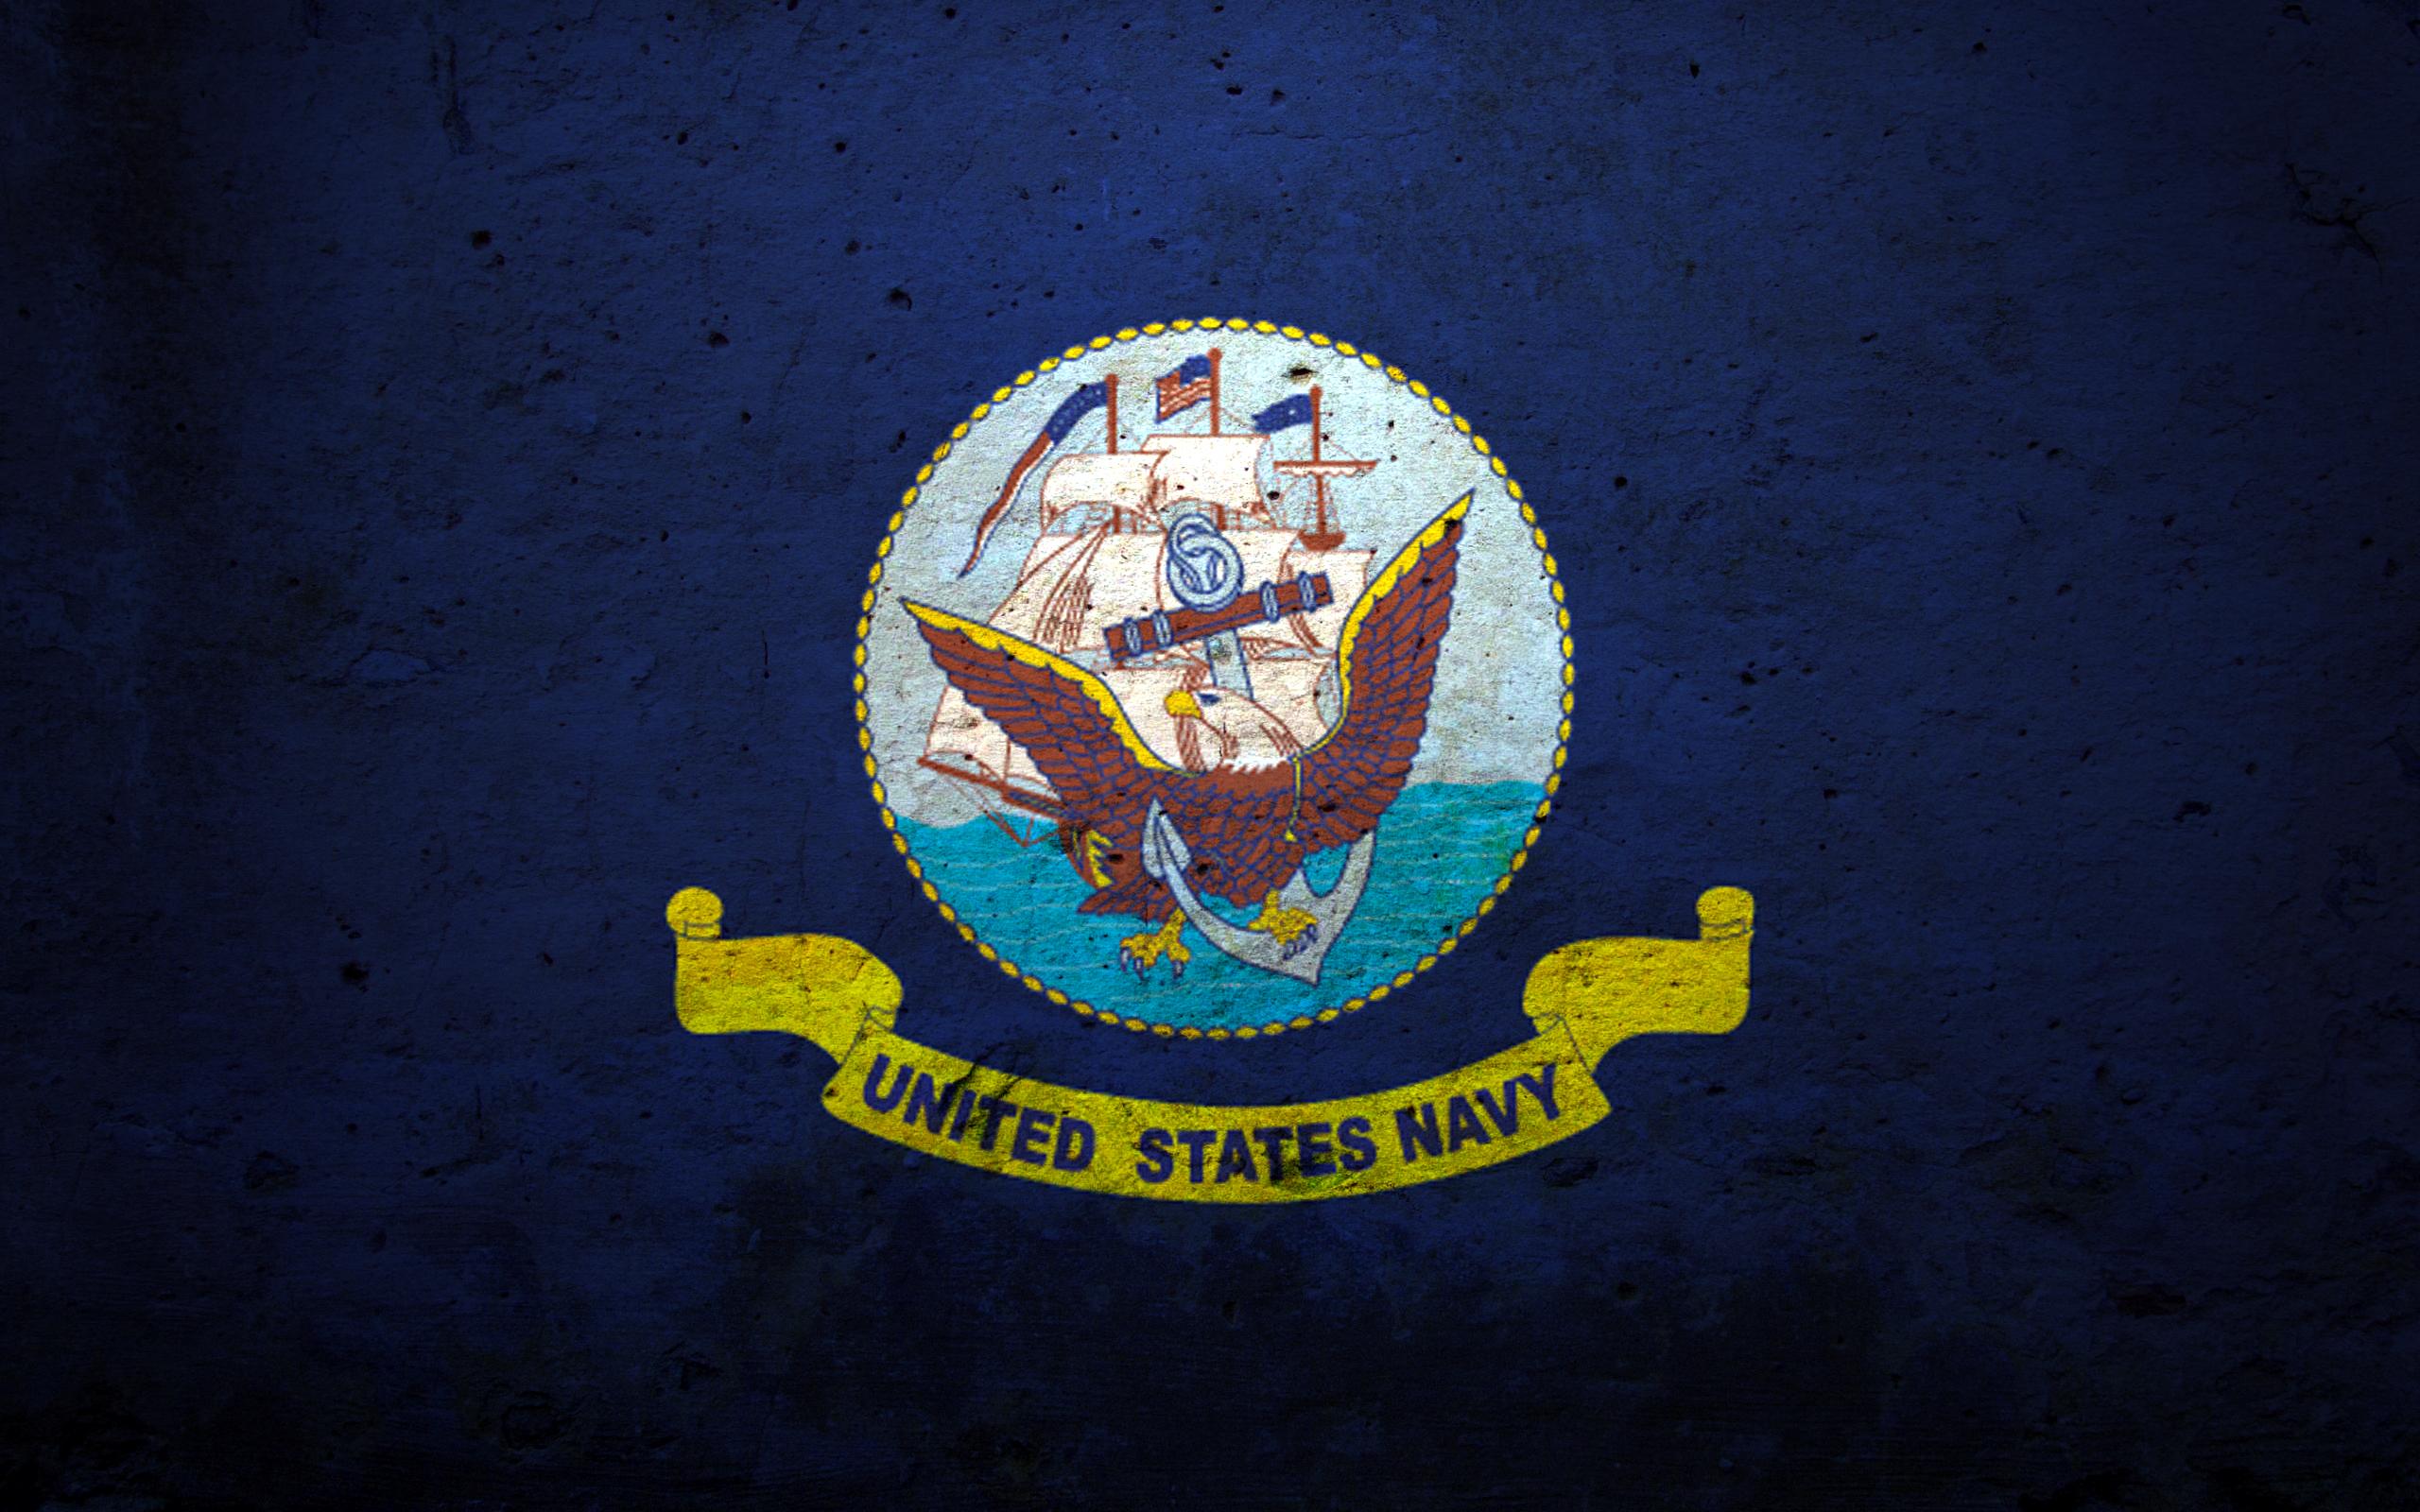 Navy Logo Wallpaper Iphone   Viewing Gallery 2560x1600